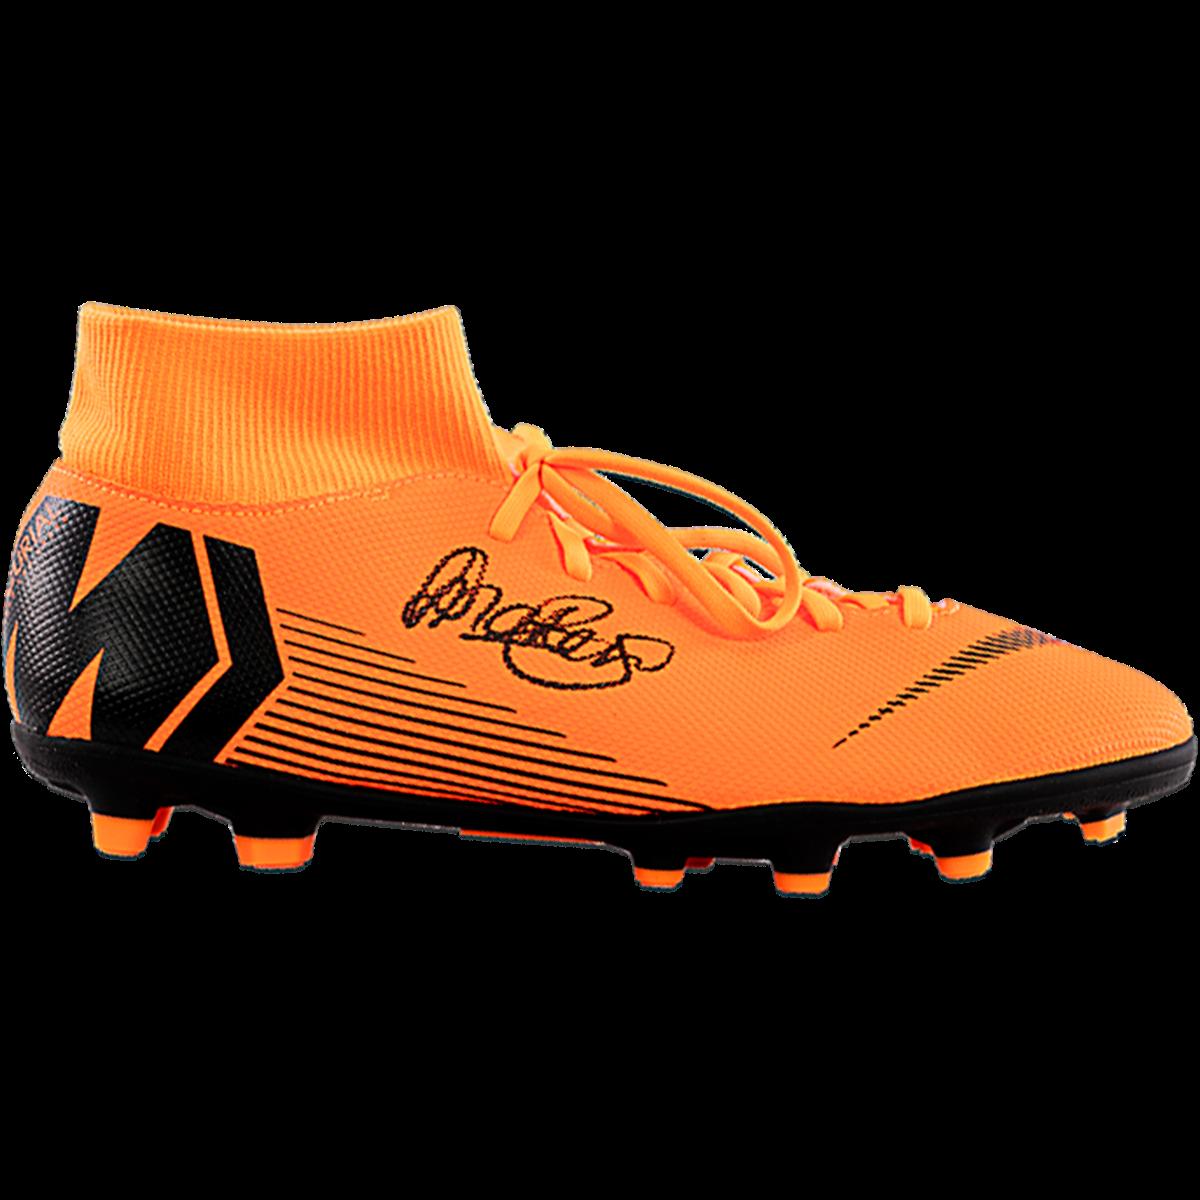 tenga en cuenta Stratford on Avon Orientar  Lieke Martens Signed Orange Nike Mercurial High Top cleat | High top  cleats, Cleats, Football boots